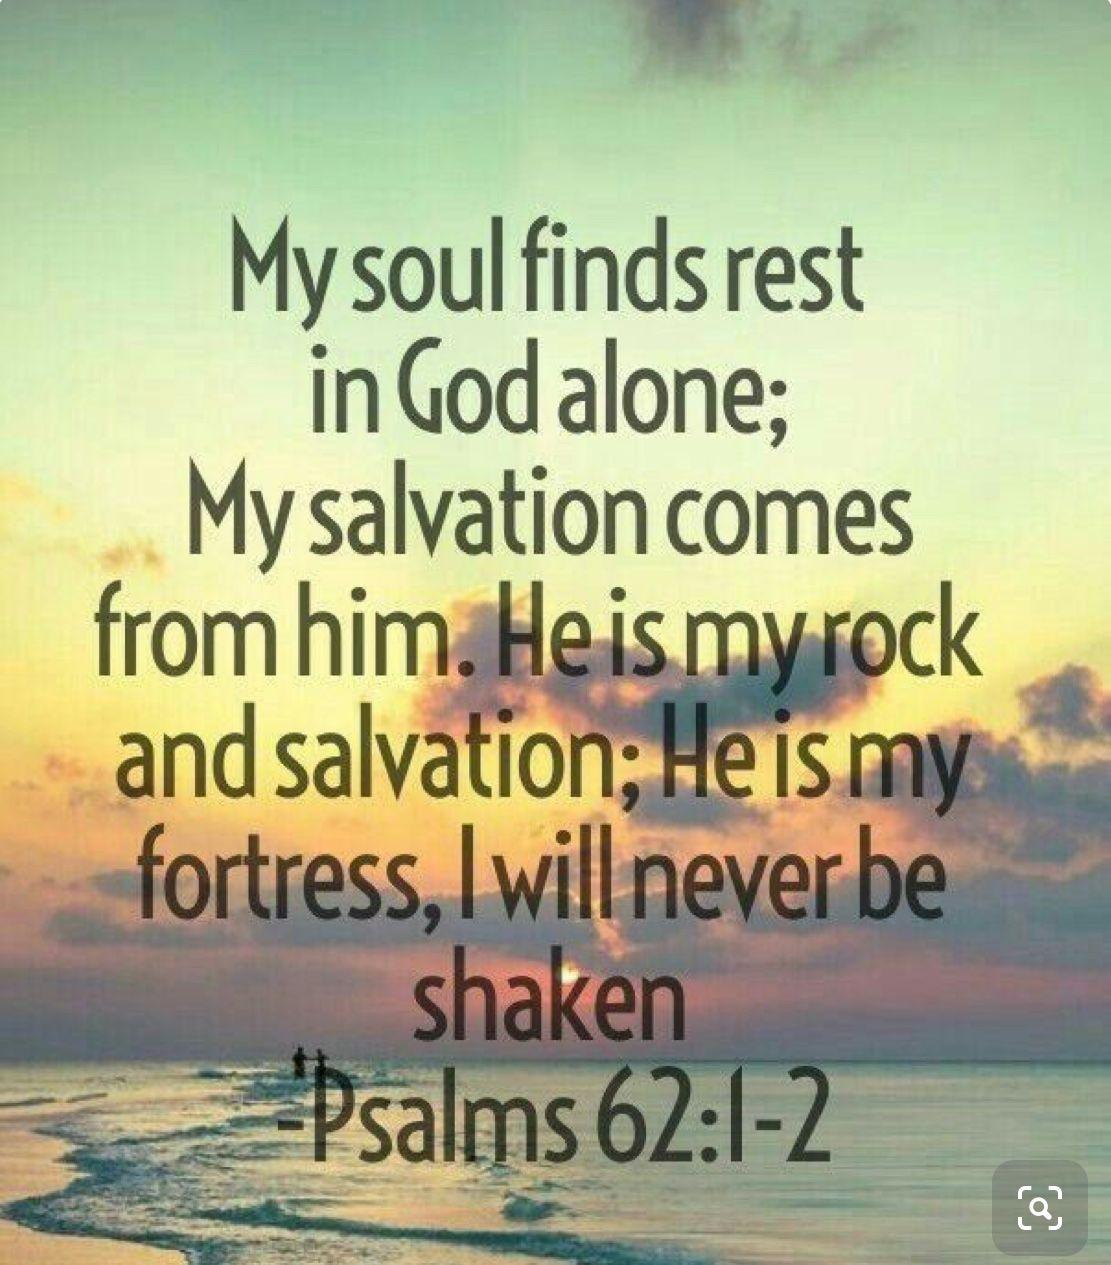 Psalm 62:1-2 | Bible verse | Healing scriptures, Favorite